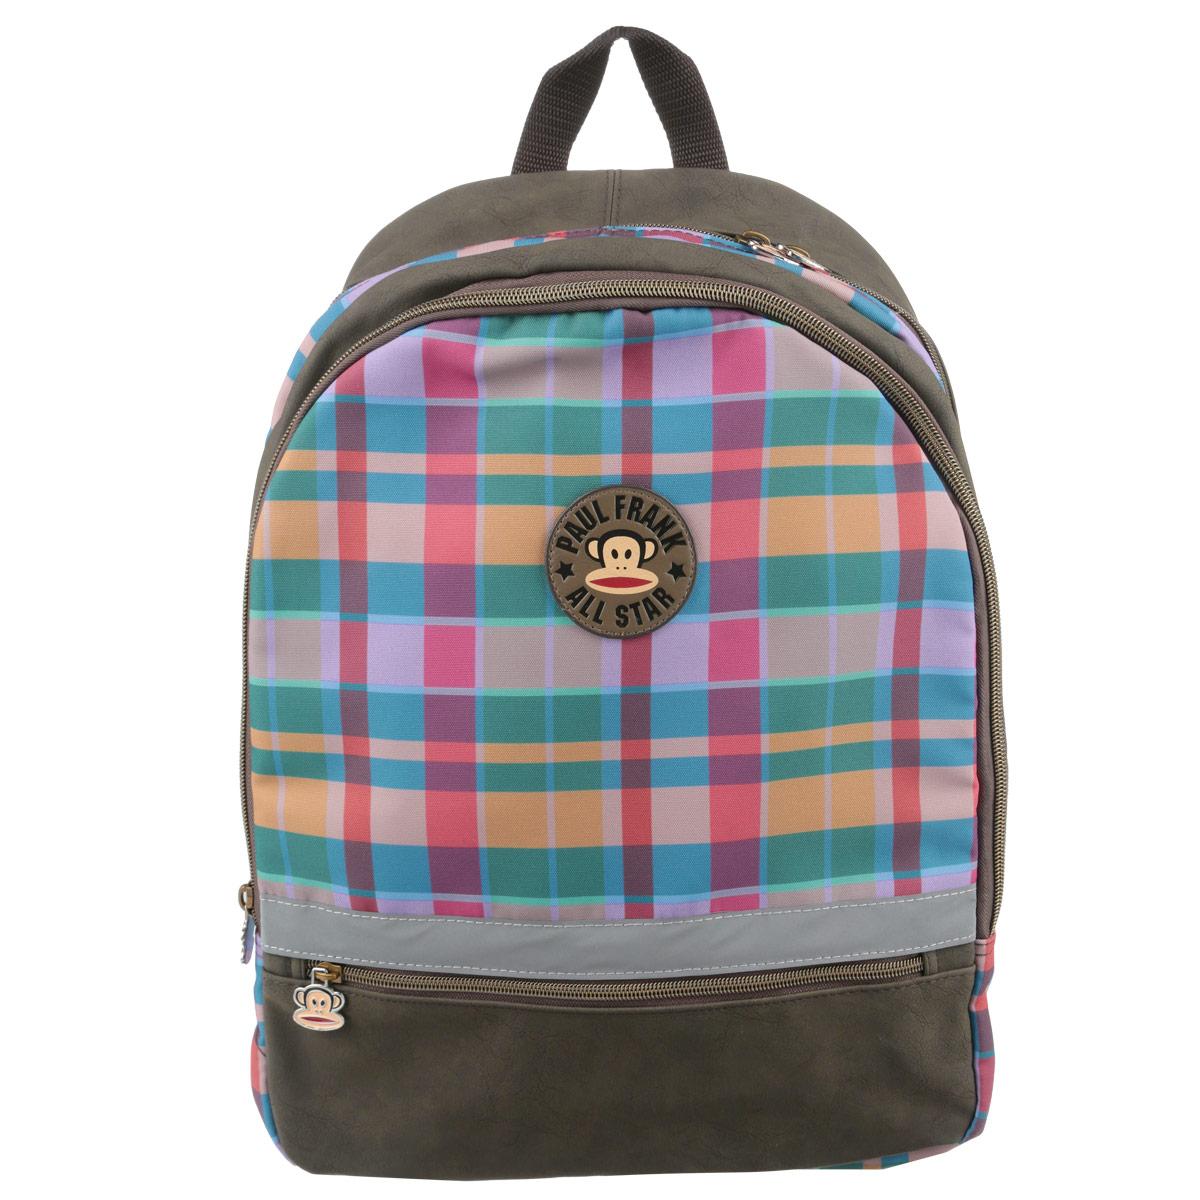 Рюкзак Kinderline Paul Frank, цвет: коричневый, розовый, зеленый сумка kinderline international mhbz us1 51box5 v3